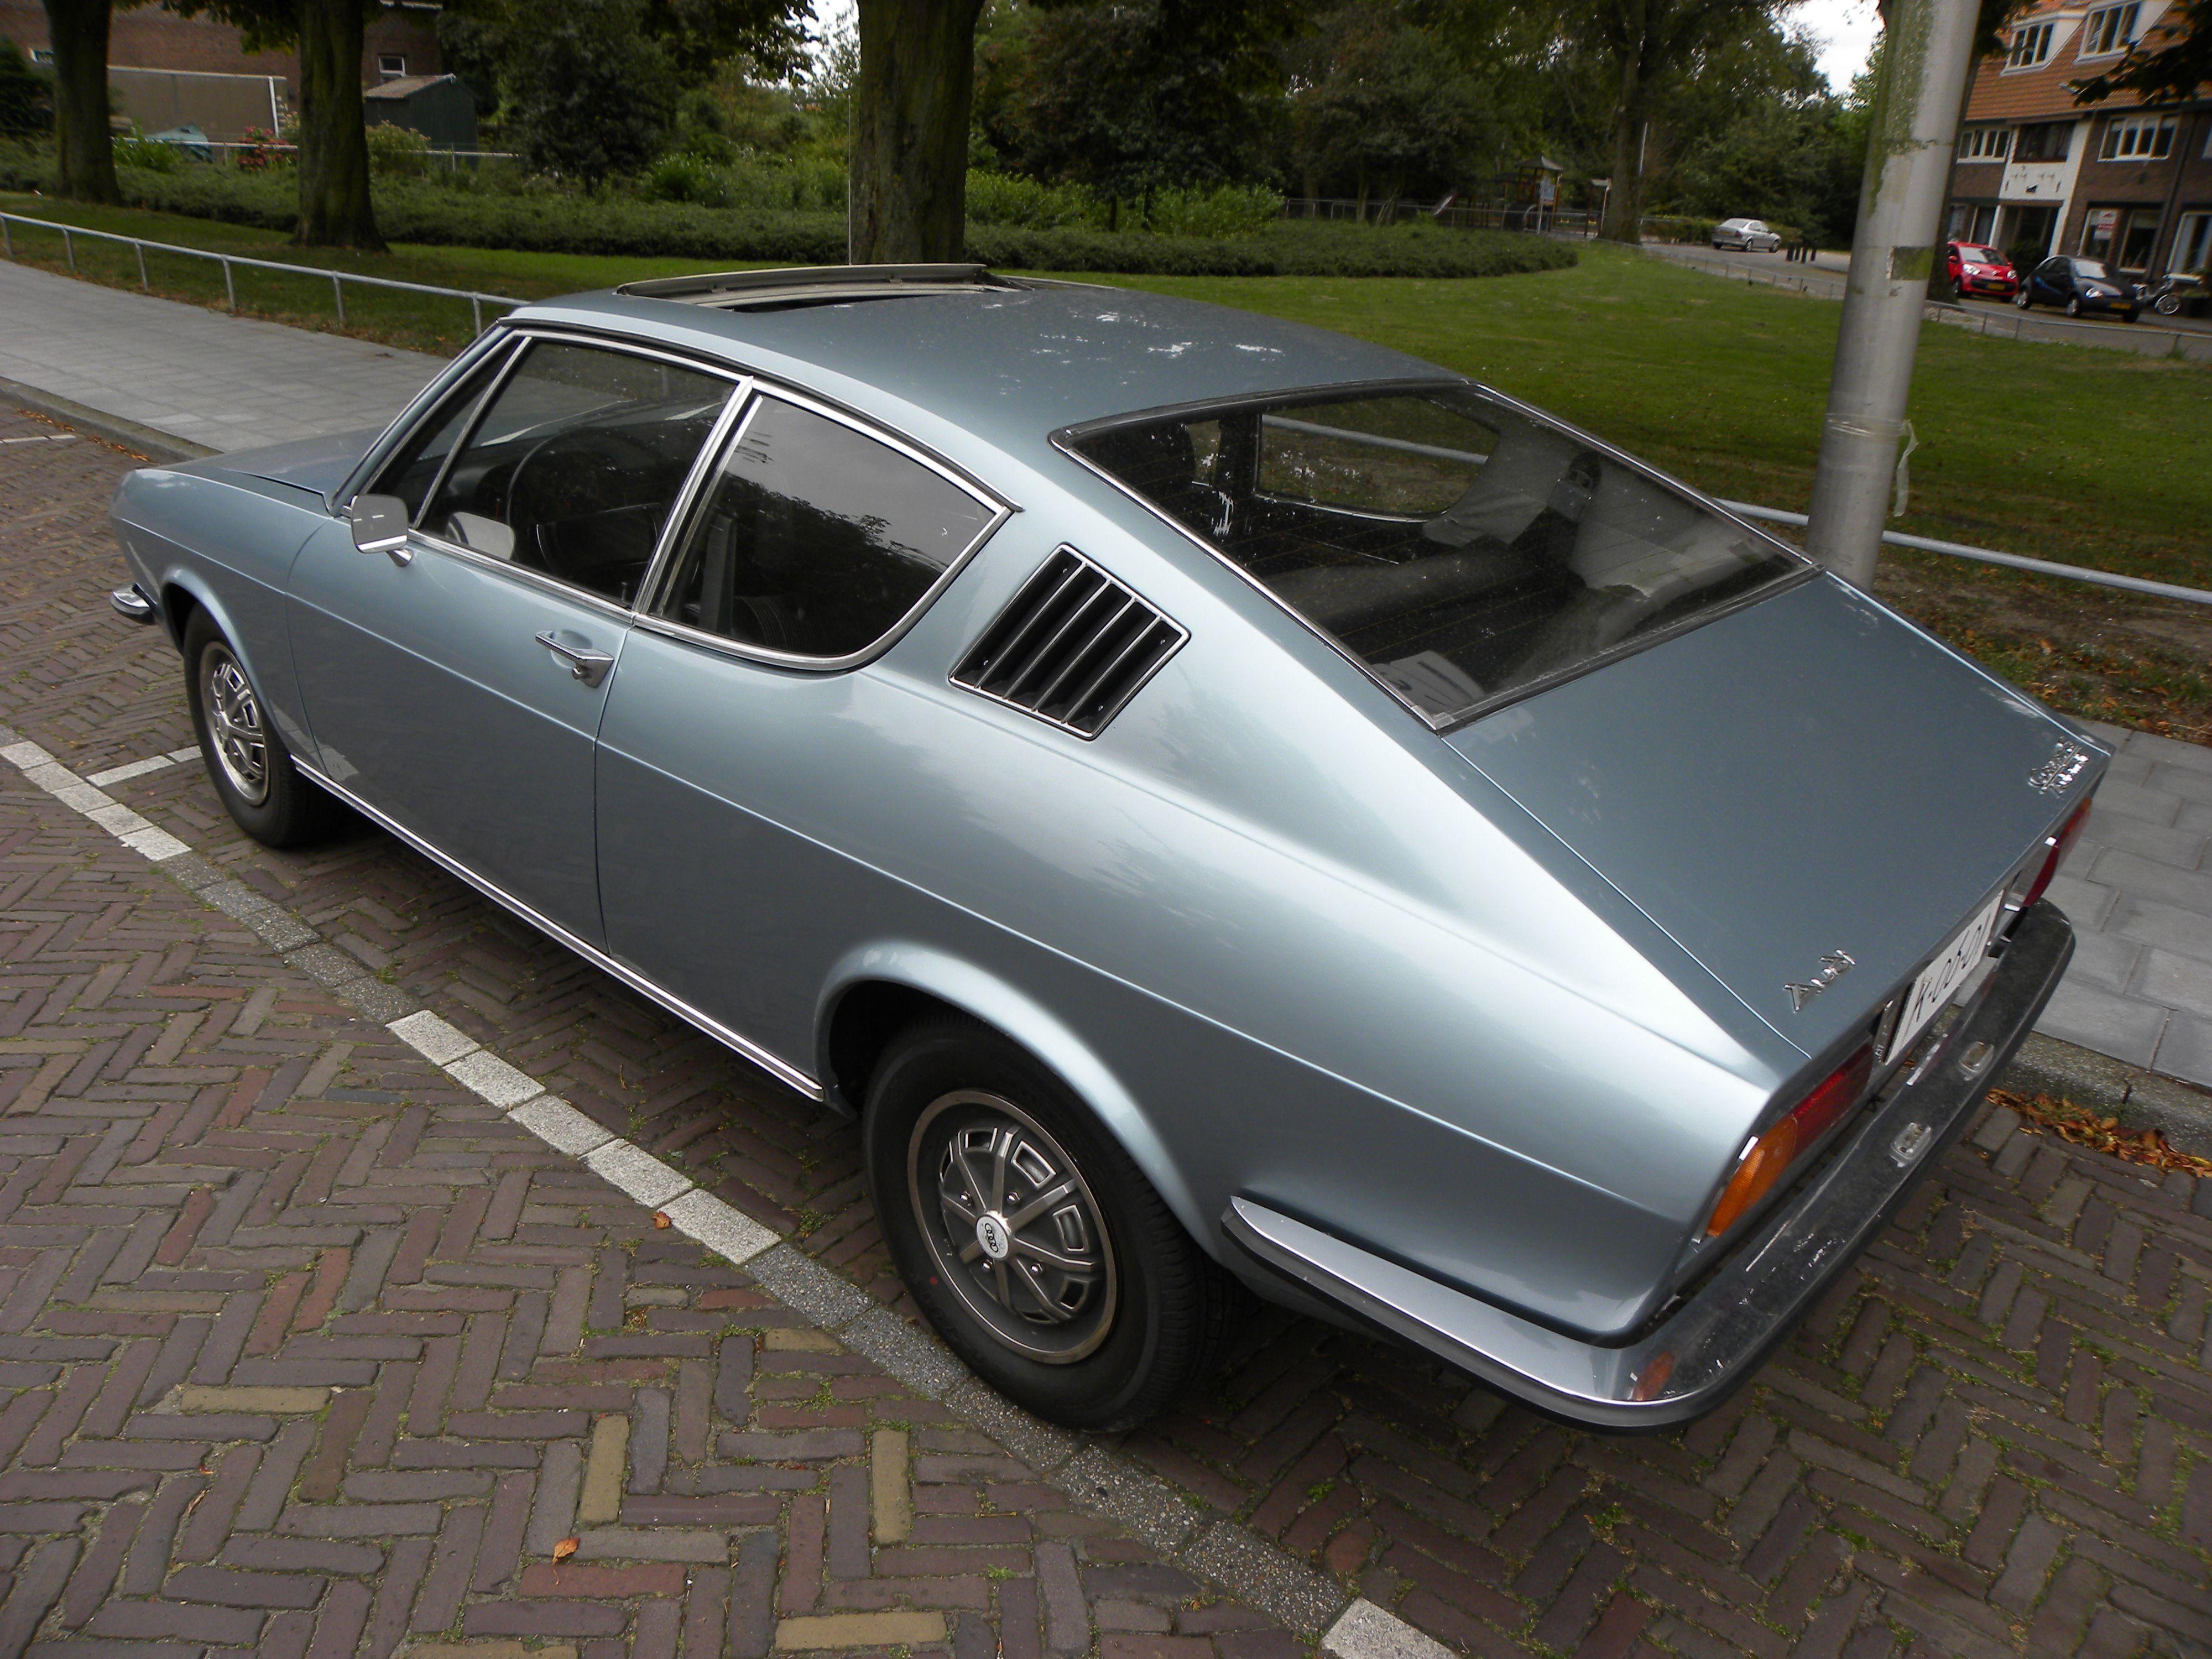 1974 Audi 100 Coupe S Automatic Audi 100 Coupe S Audi 100 Retro Cars